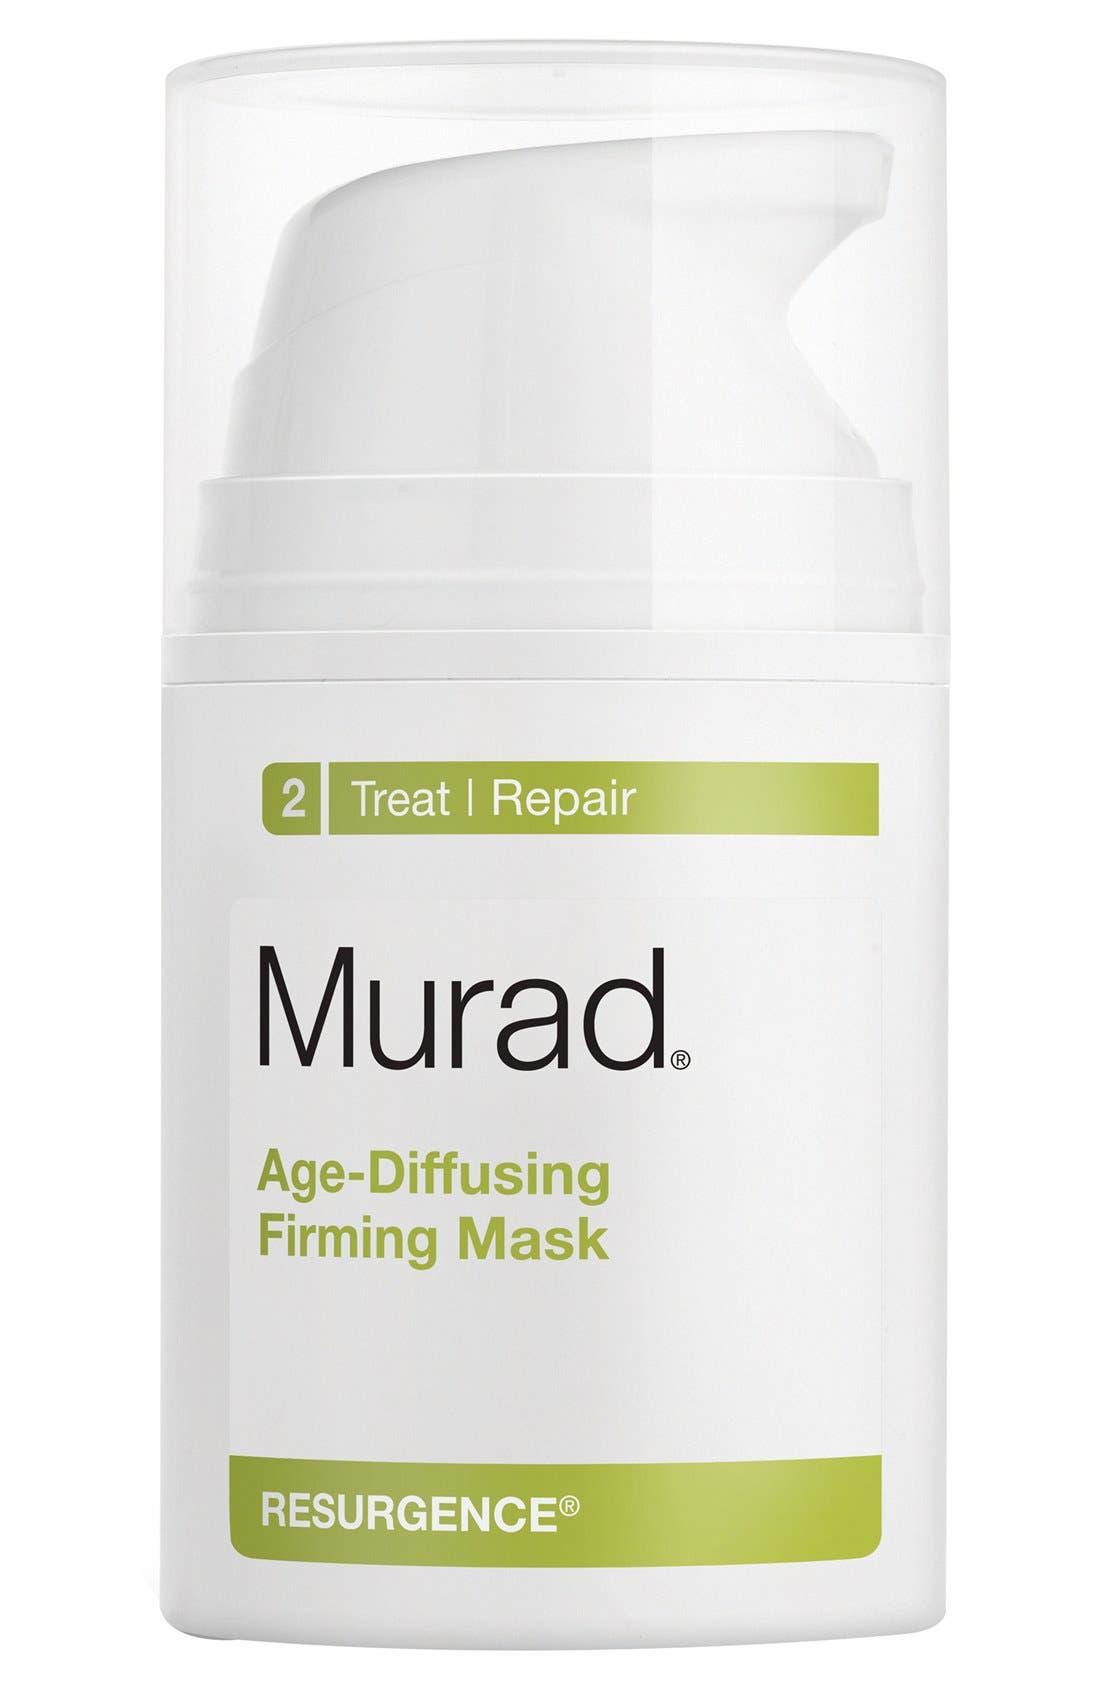 Murad® Age-Diffusing Firming Mask